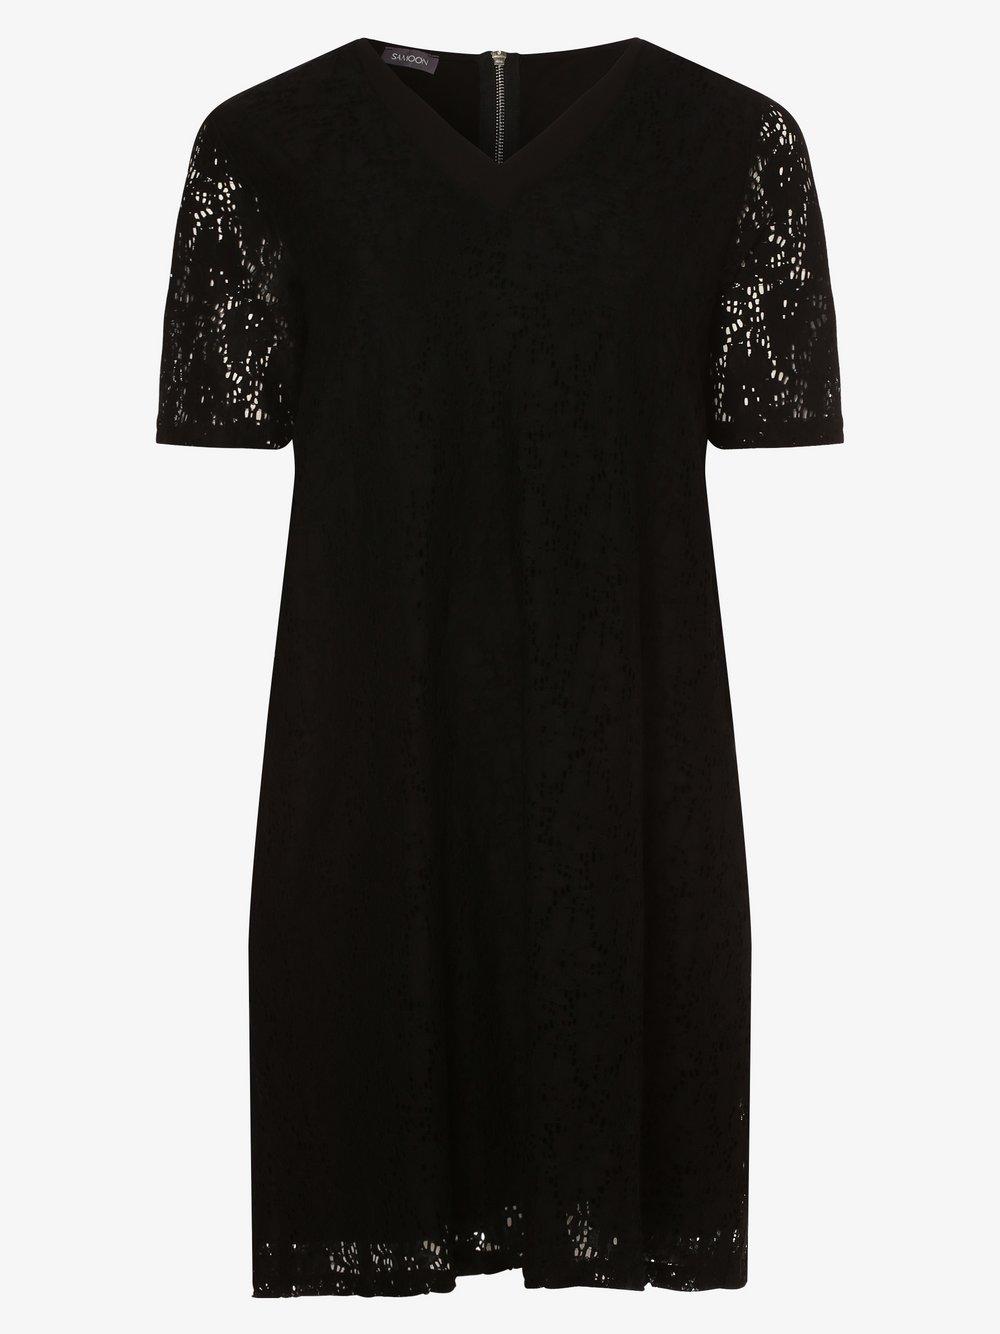 Samoon - Sukienka damska, czarny